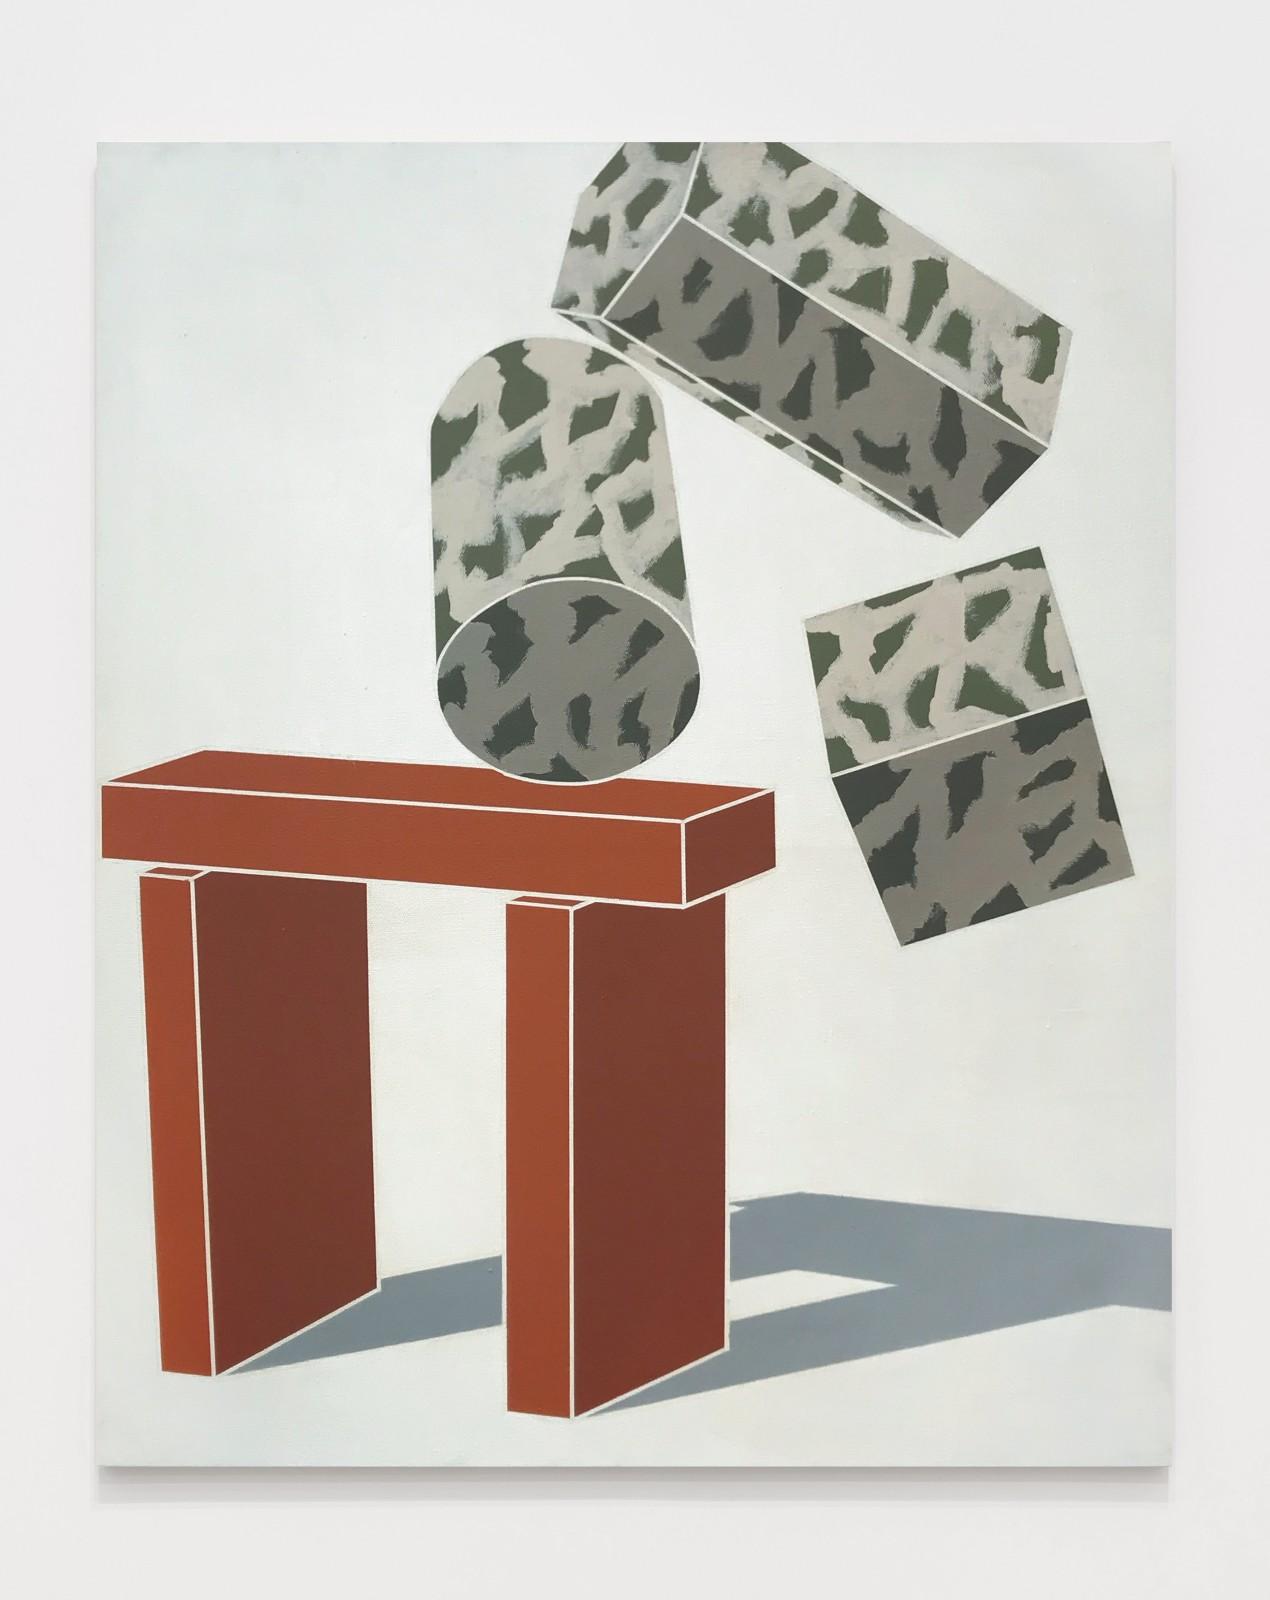 "<span class=""link fancybox-details-link""><a href=""/exhibitions/553/works/artworks_standalone11001/"">View Detail Page</a></span><div class=""artist""><span class=""artist""><strong>EMILIO TADINI</strong></span></div><div class=""title""><em>Paesaggio Occidentale / Western Landscape</em>, 1970</div><div class=""medium"">Acrylic on canvas</div><div class=""dimensions""><div class=""dimensions"">39 3/8 x 31 7/8 inches</div><div class=""dimensions"">(100 x 81 cm)</div></div>"